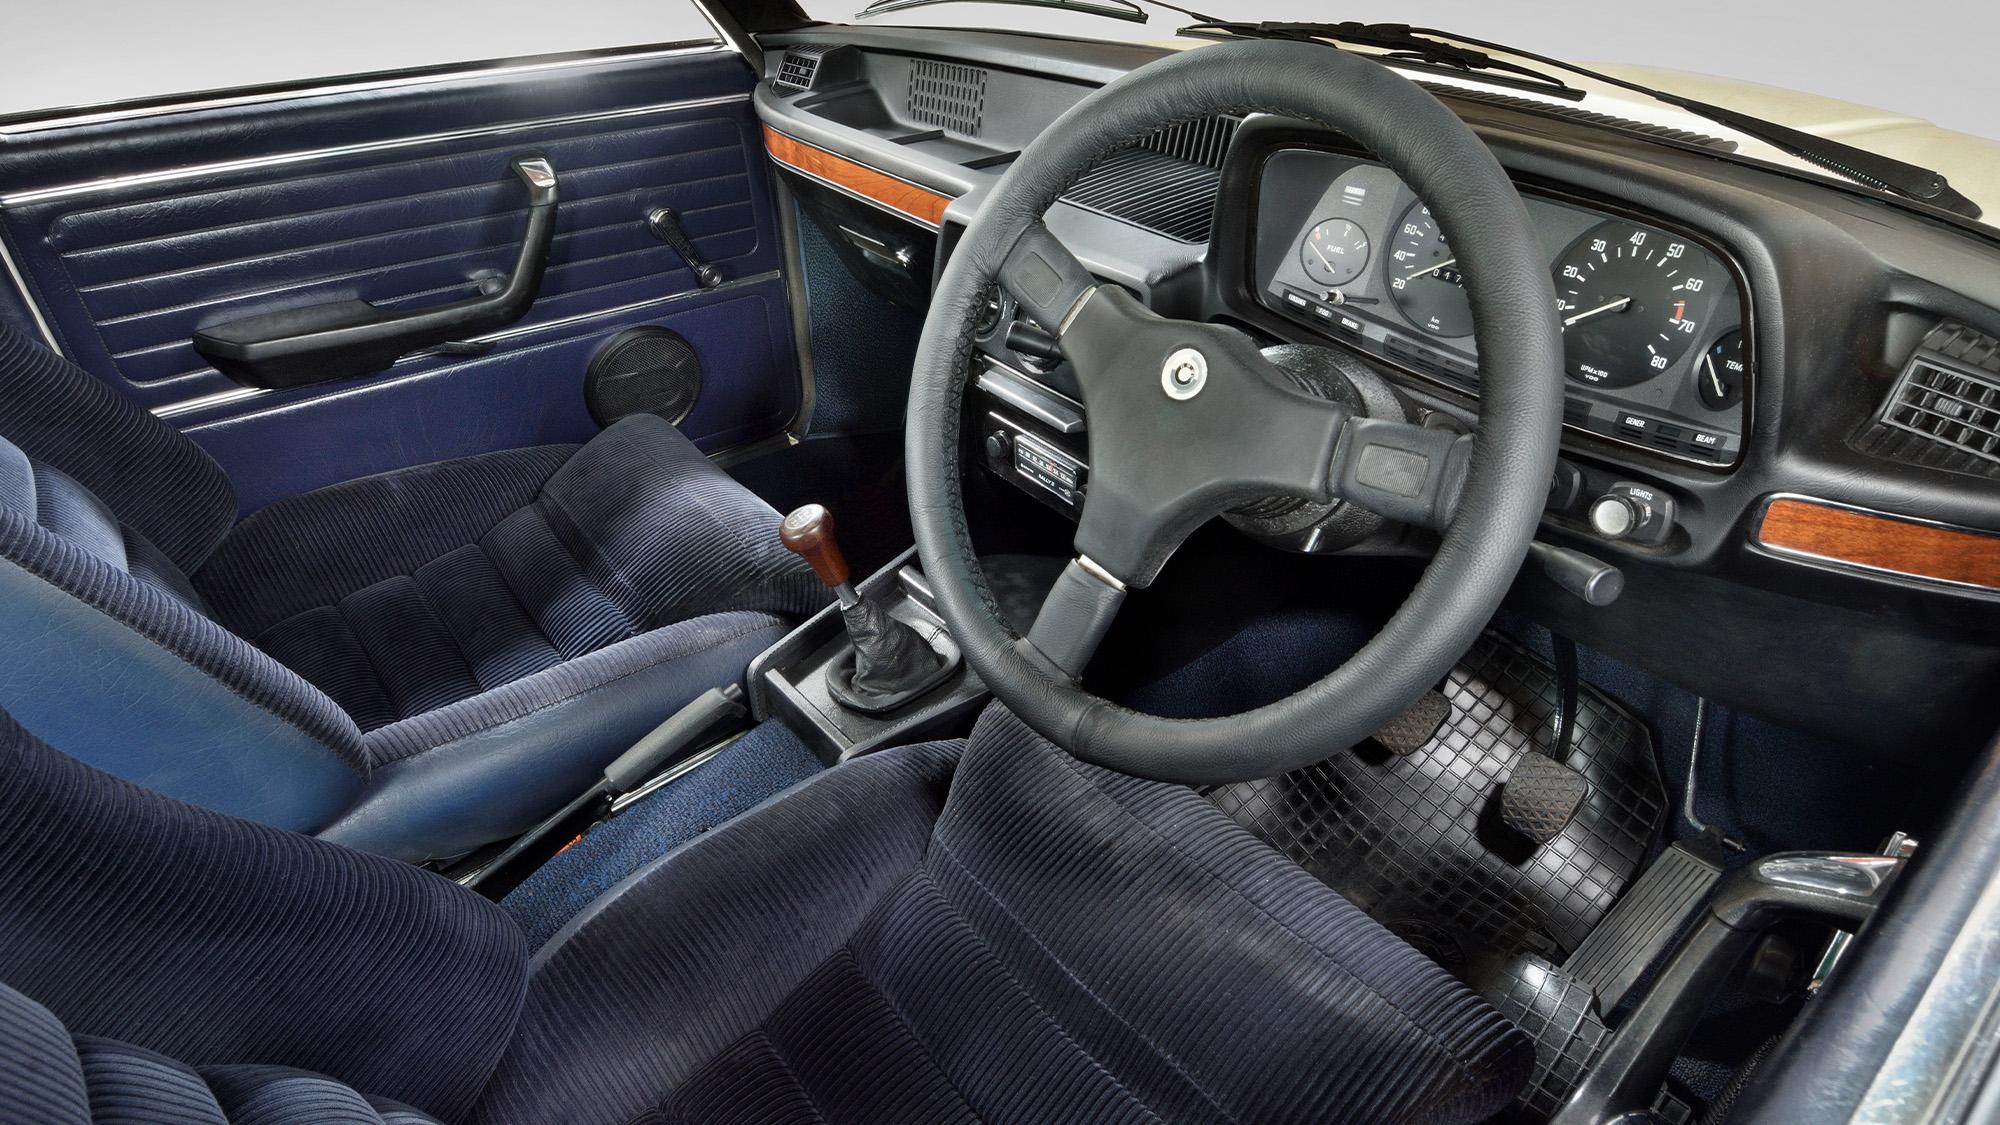 BMW 530 MLE drivers seat